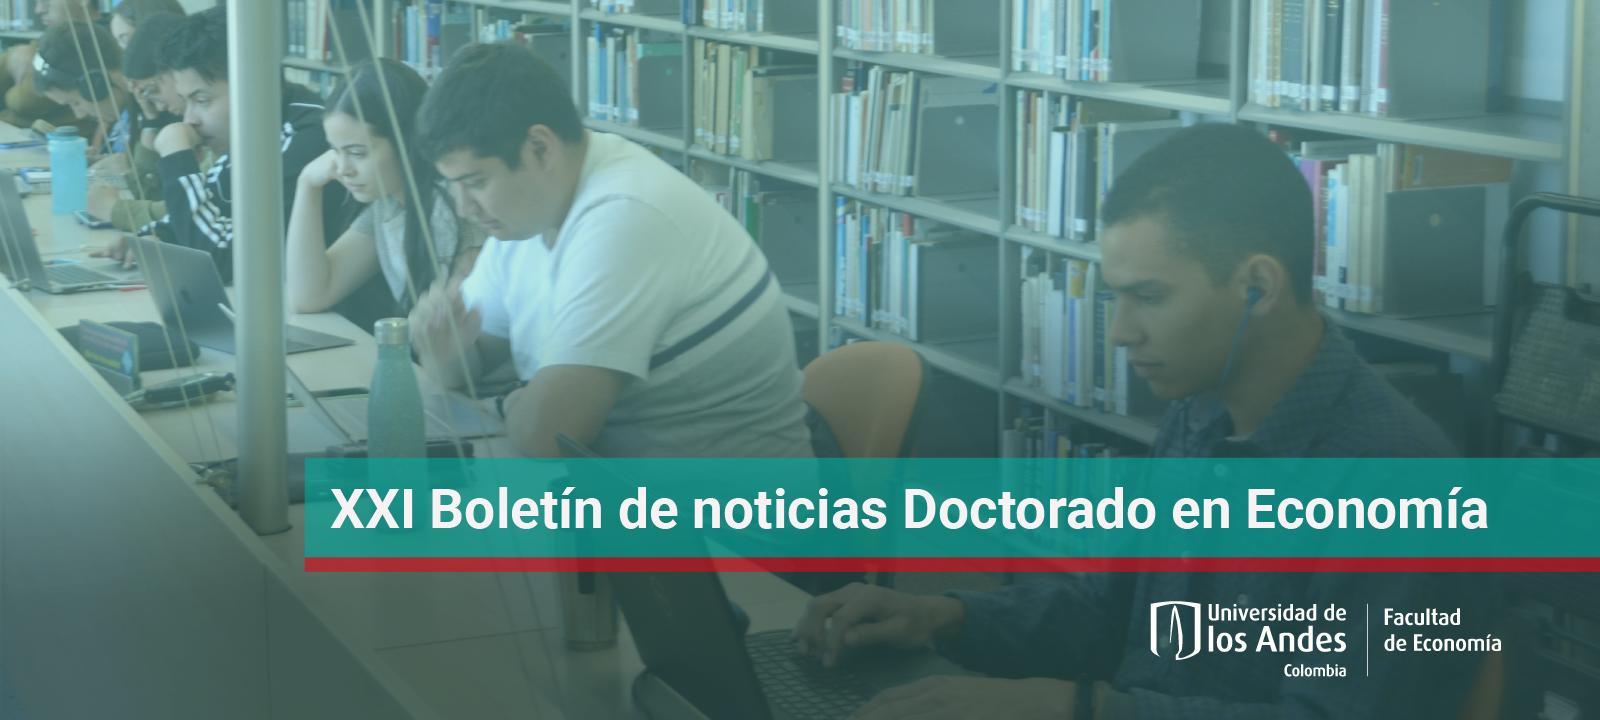 XXI-boletin-doctorado-desktop.png